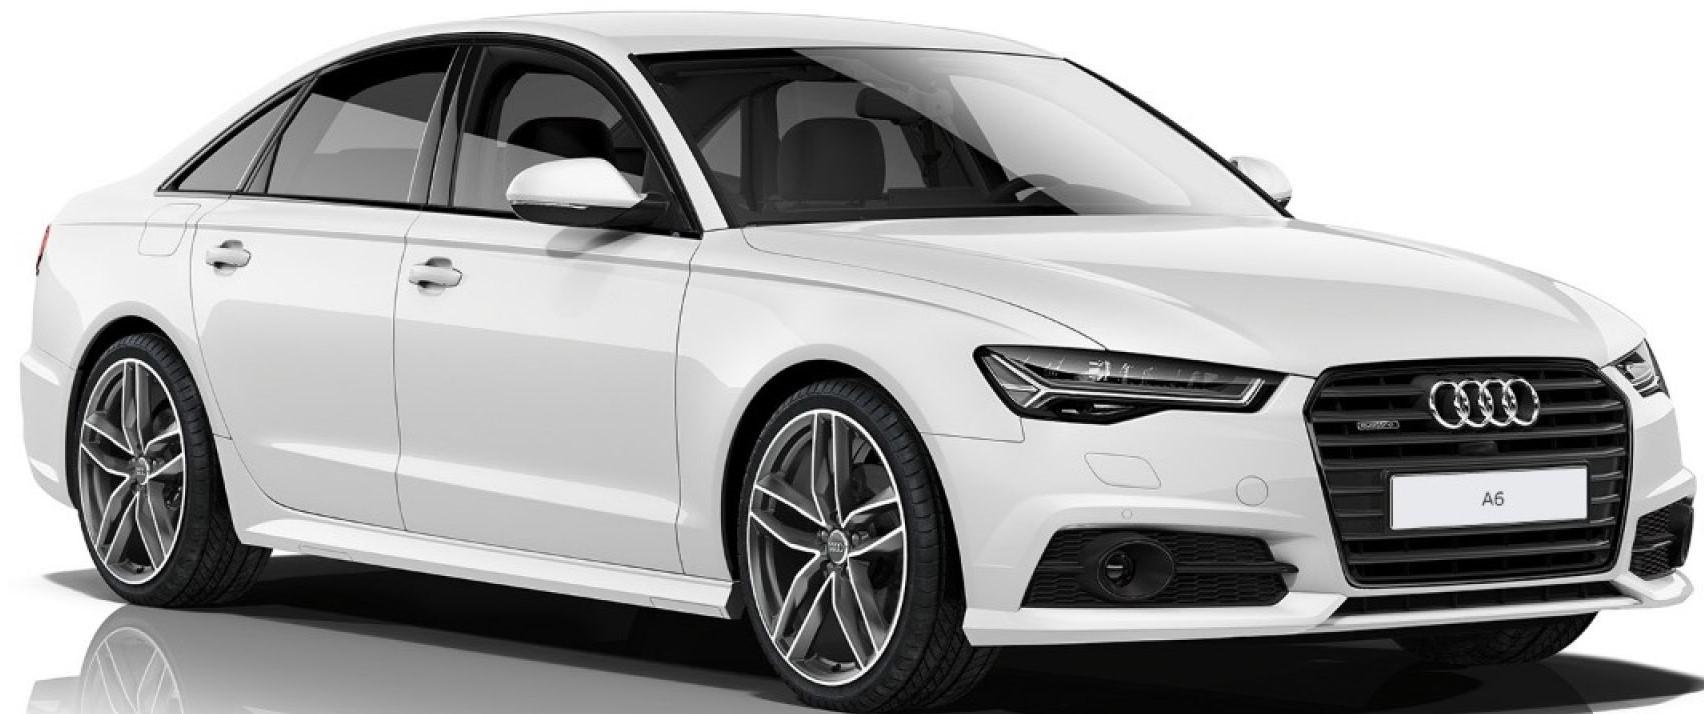 Audi A6 Owner's Workshop Manuals PDF